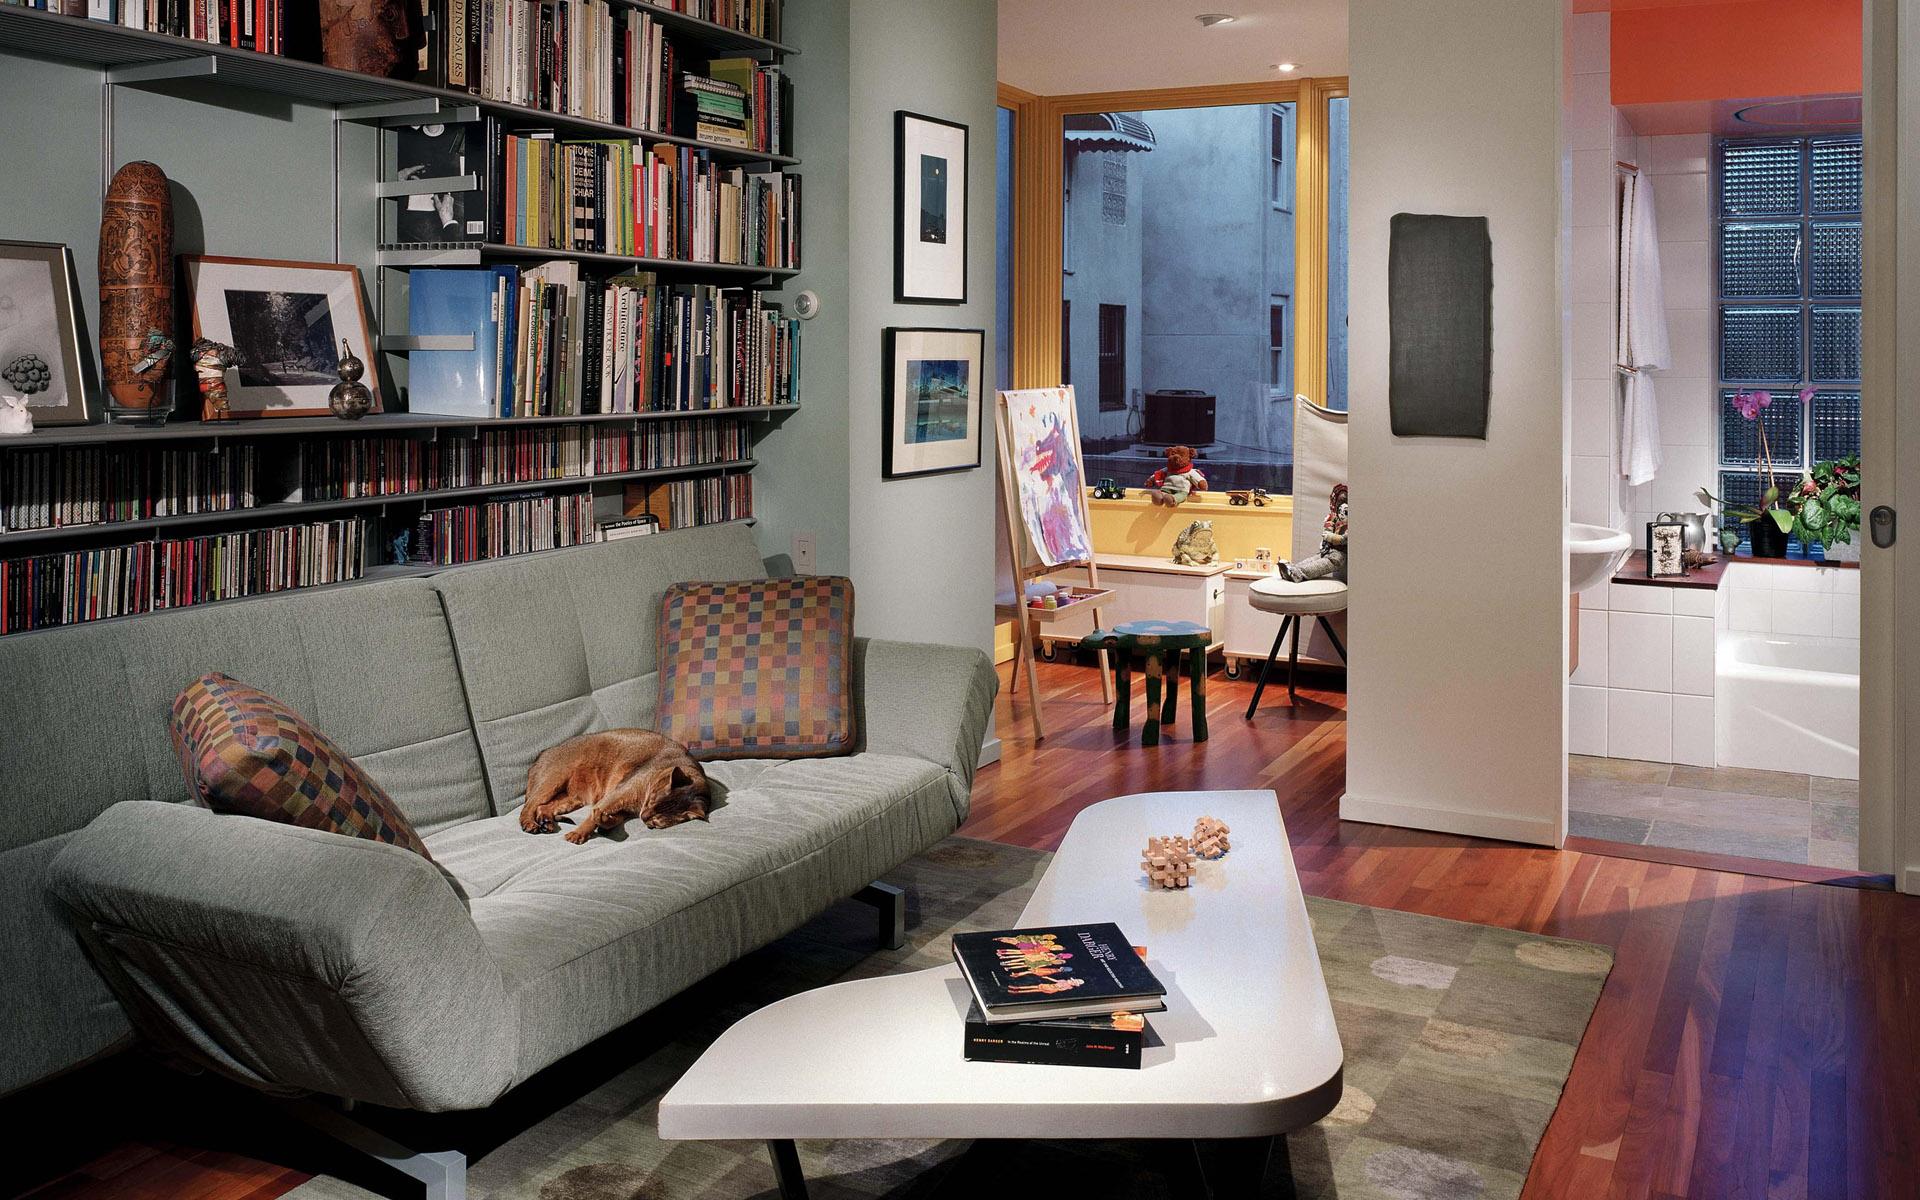 rural-study-room study room idea